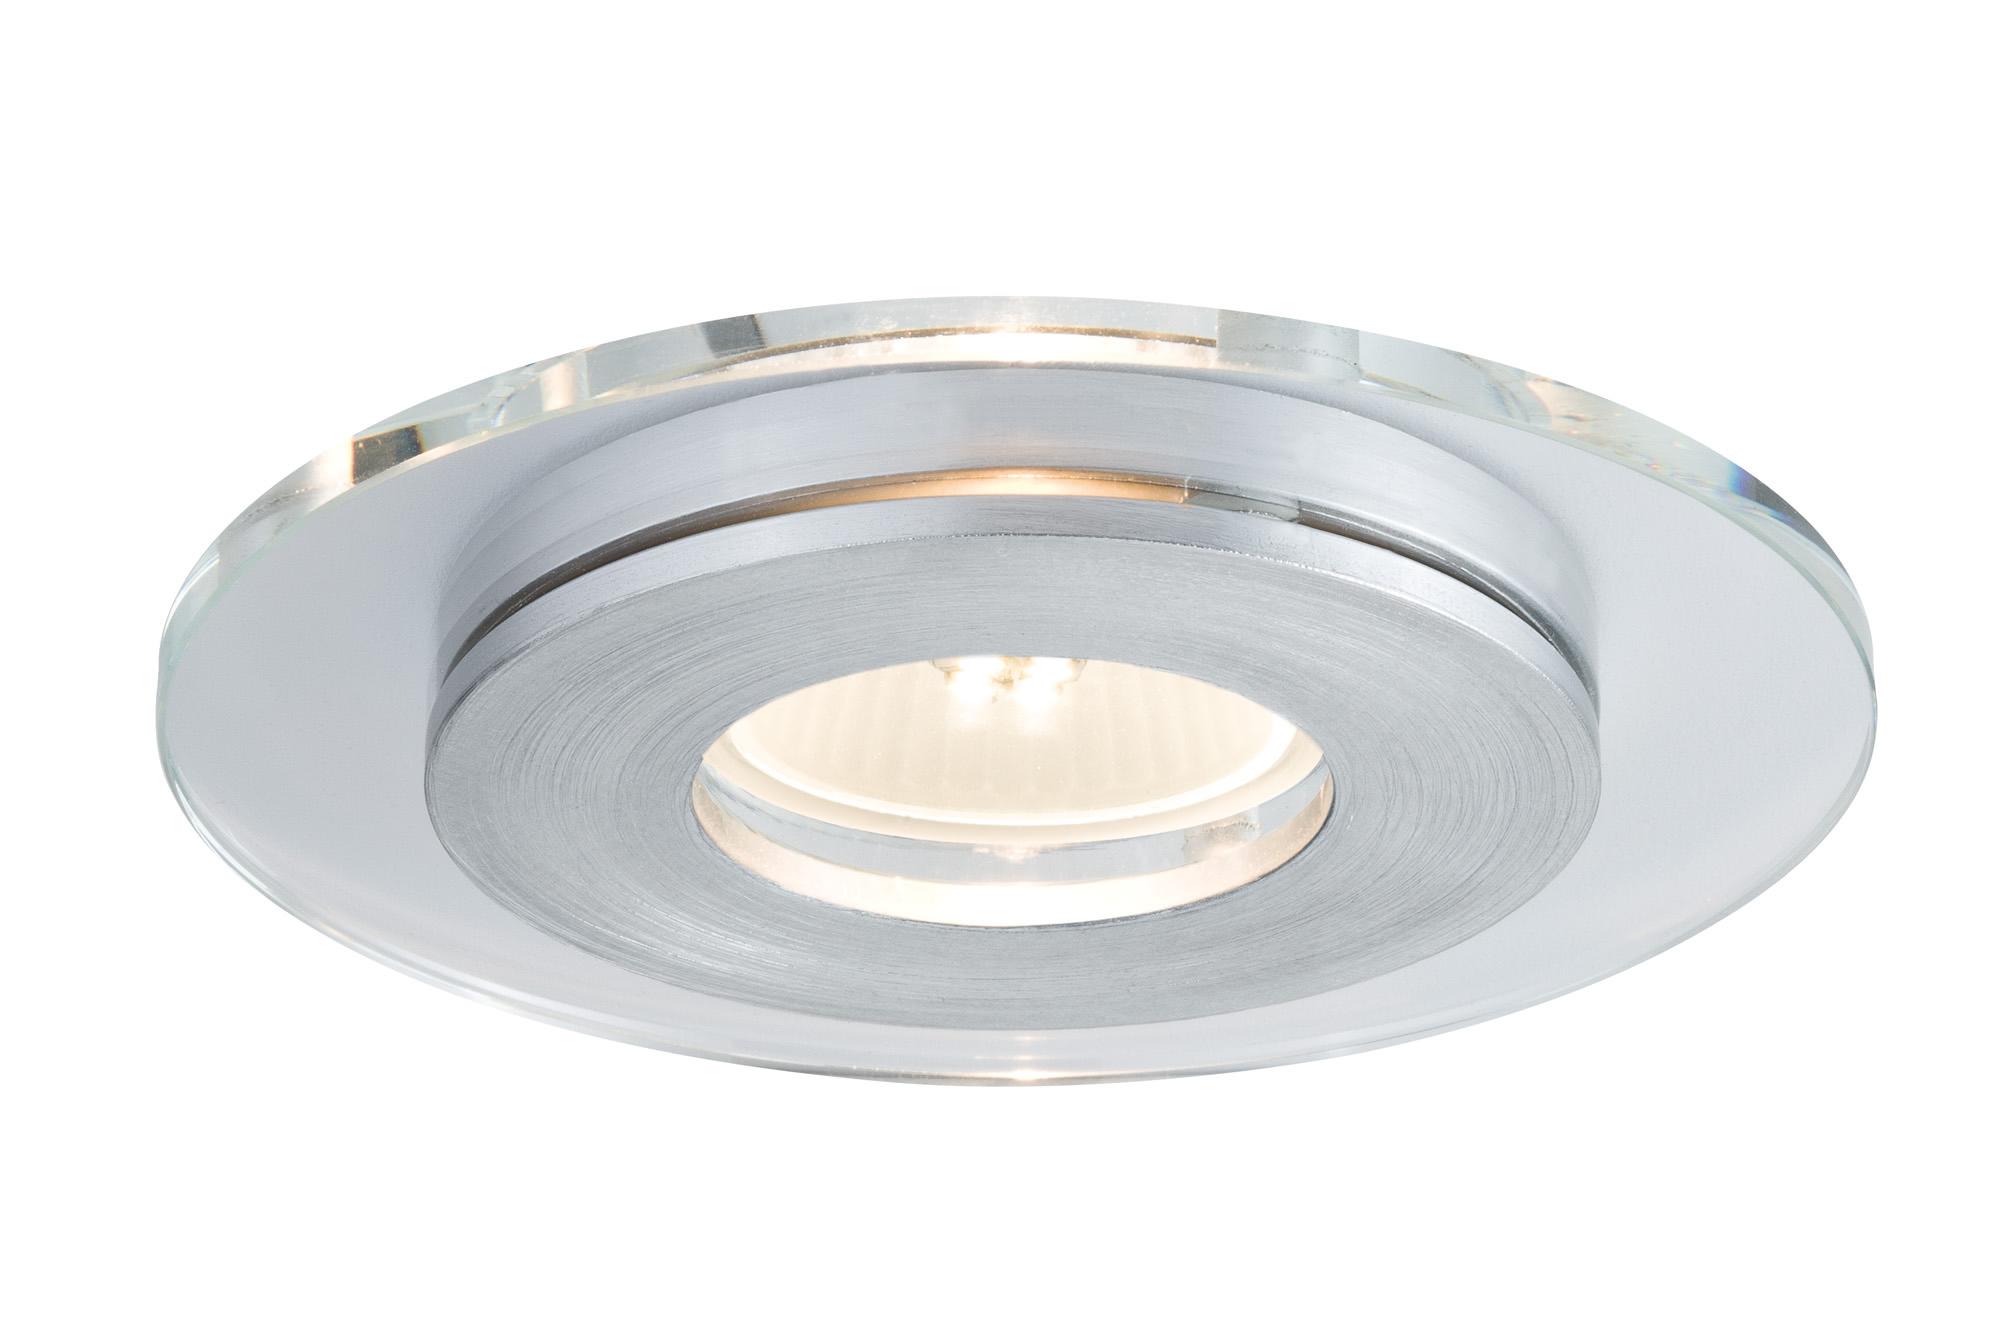 Paulmann. 92726 Светильник встроенный Premium EBL Single Shell 3x3,5W GU10, алюм.